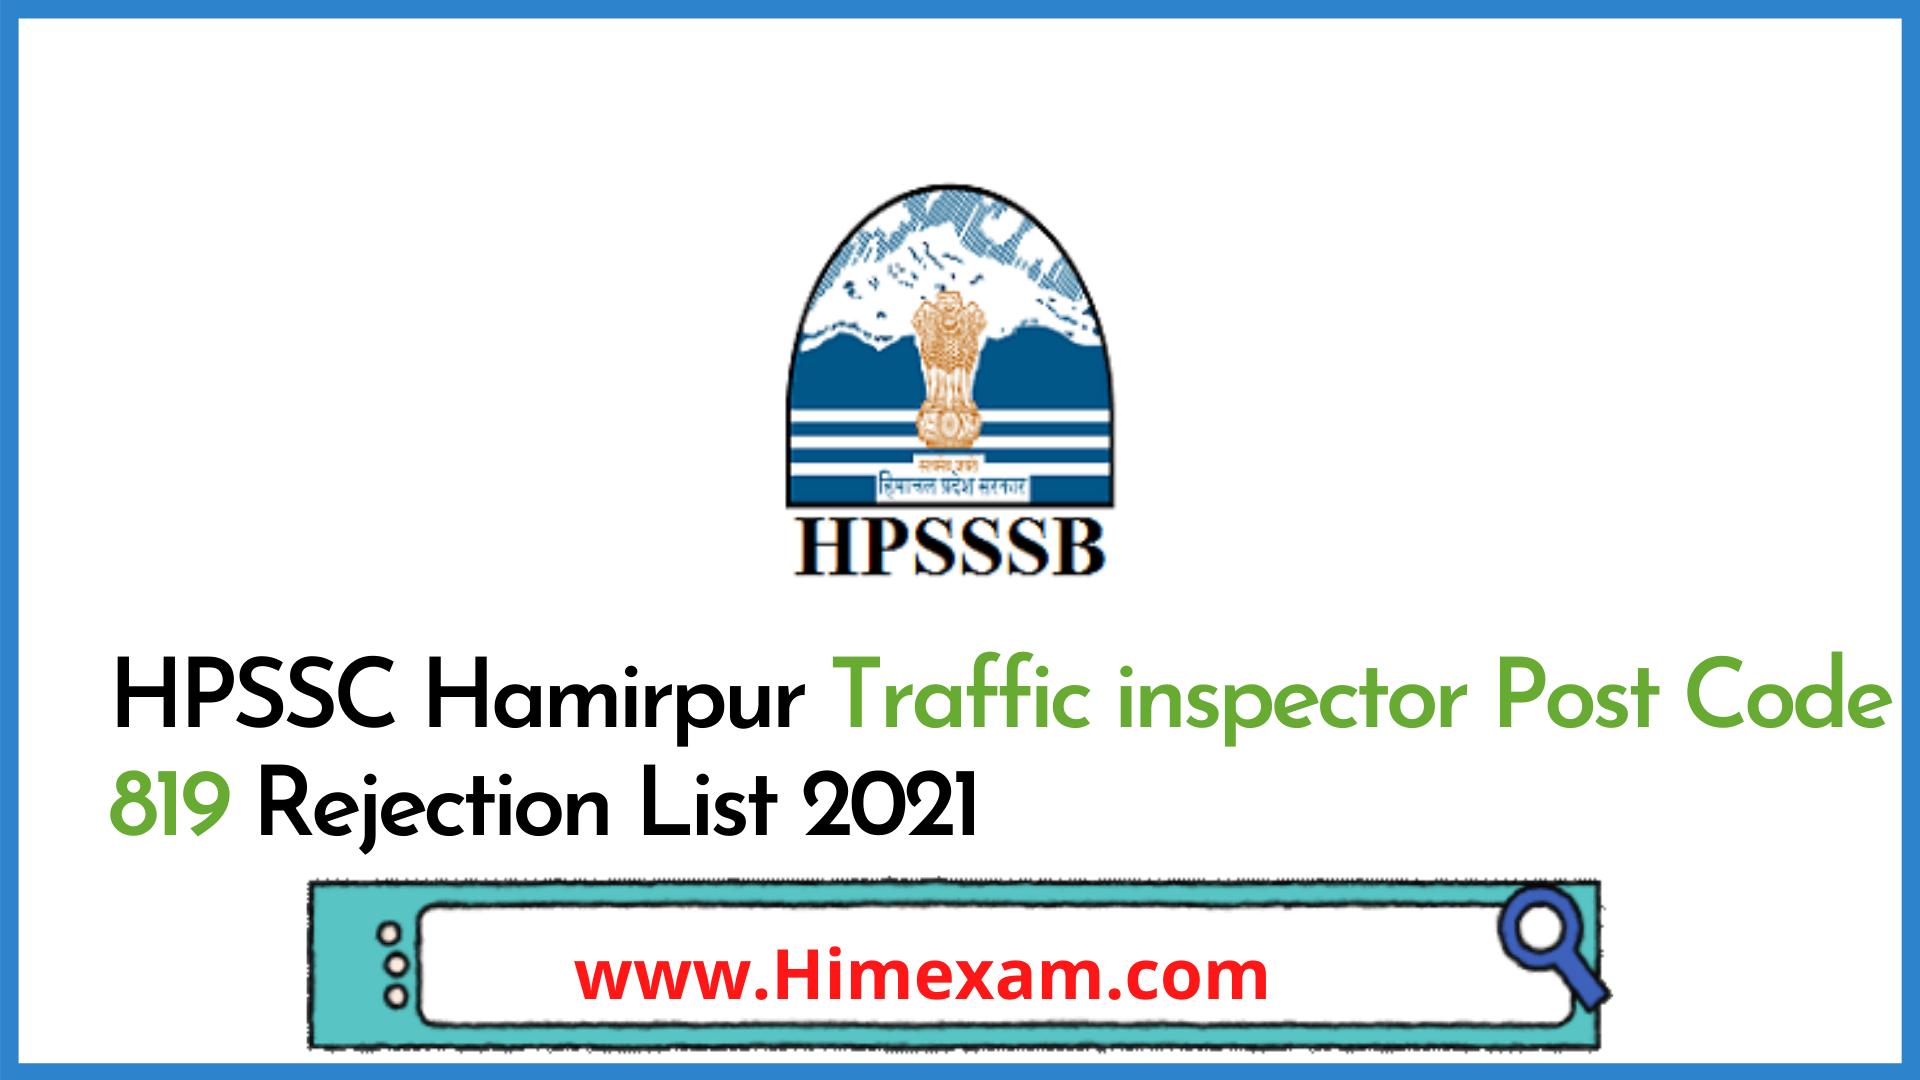 HPSSC Hamirpur Traffic inspector Post Code 819 Rejection List 2021